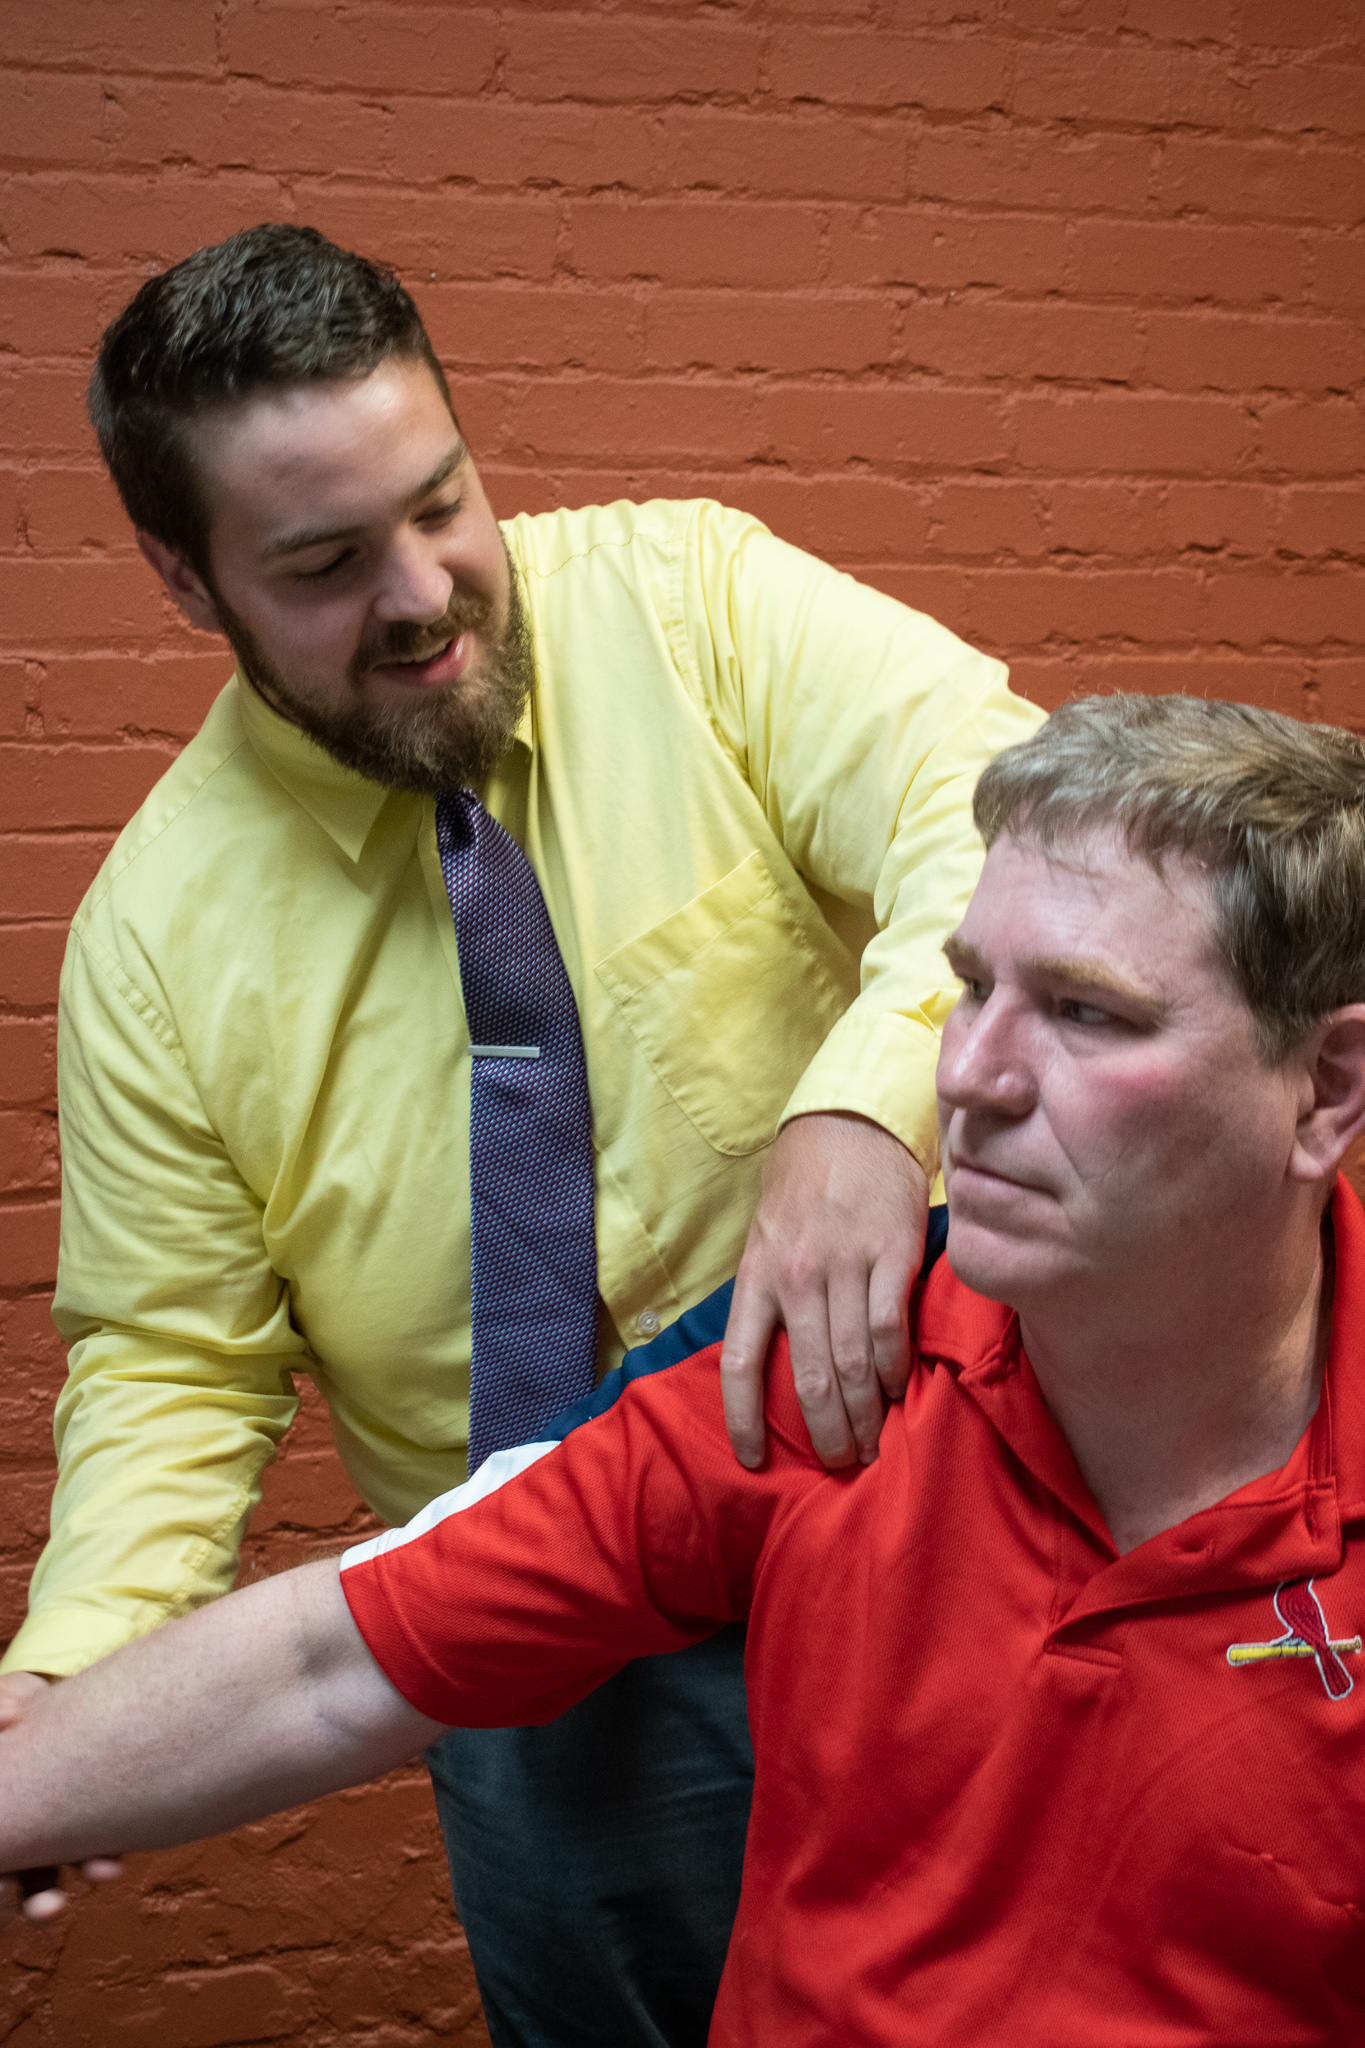 Dr. Wright adjusting patient